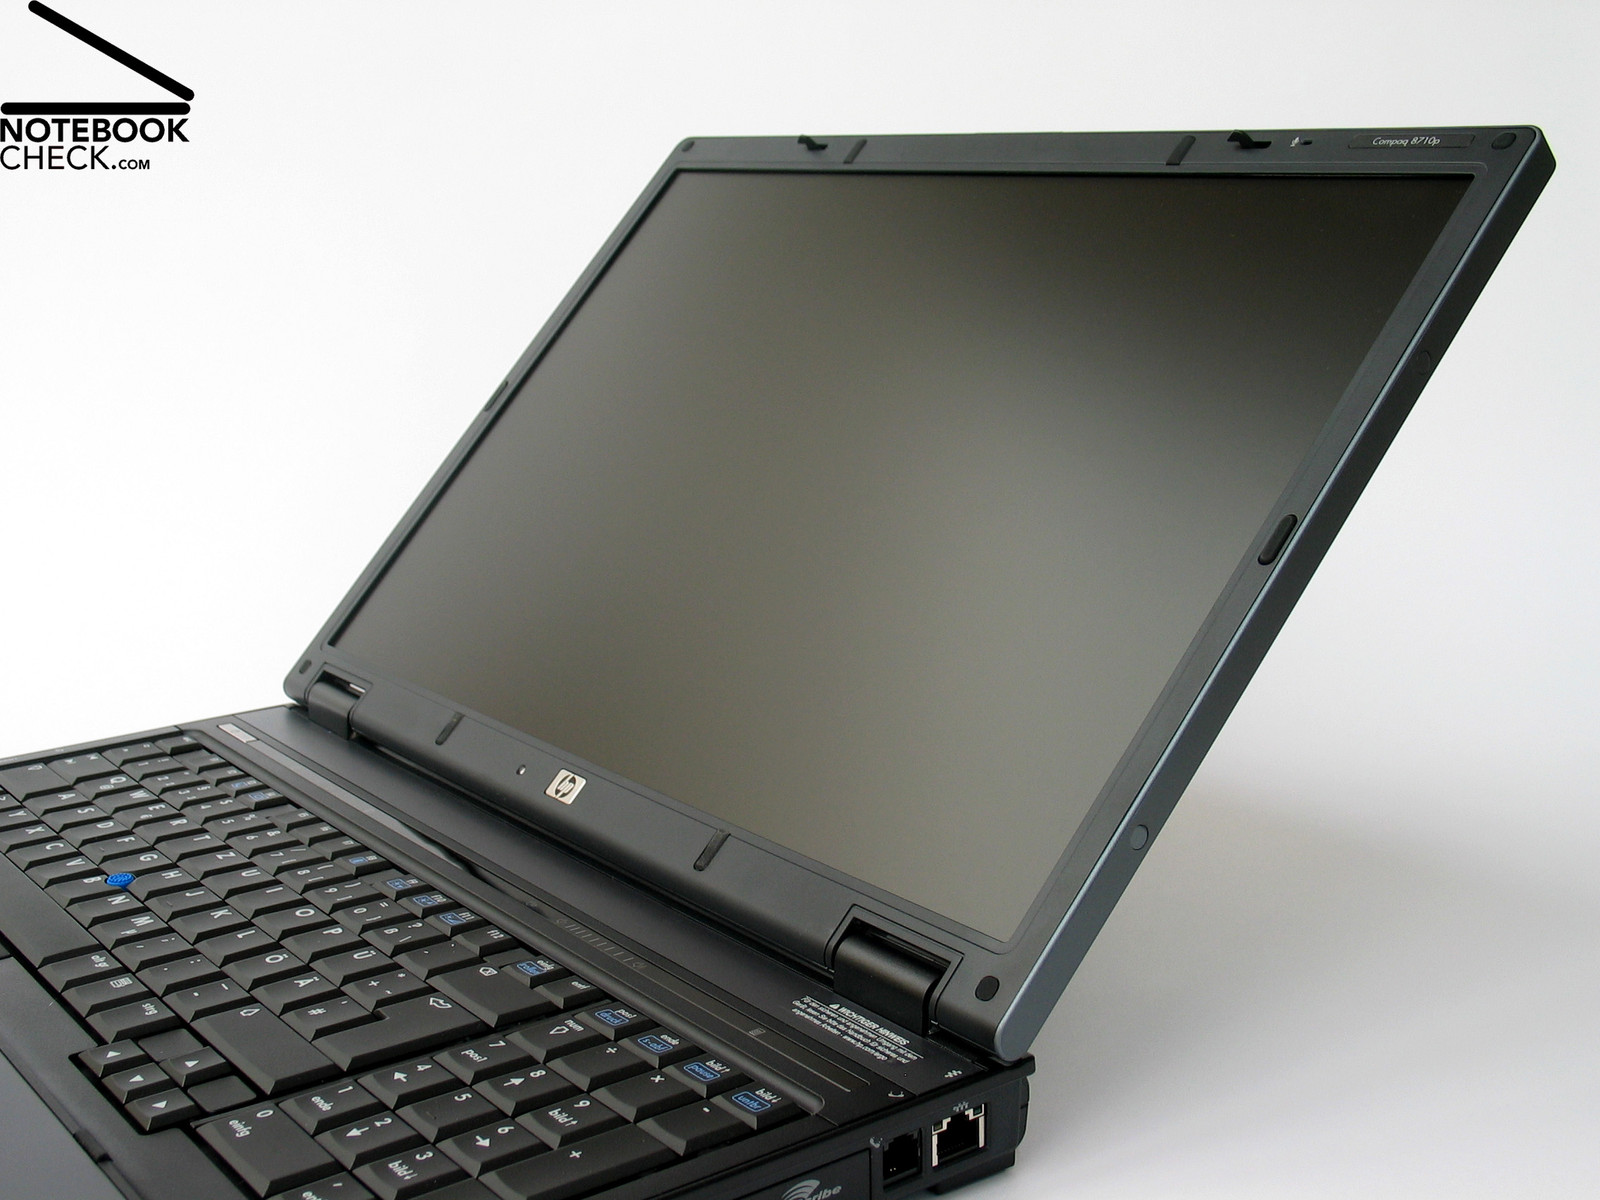 HP Compaq nx9420 Notebook Fujitsu HDD Driver for PC